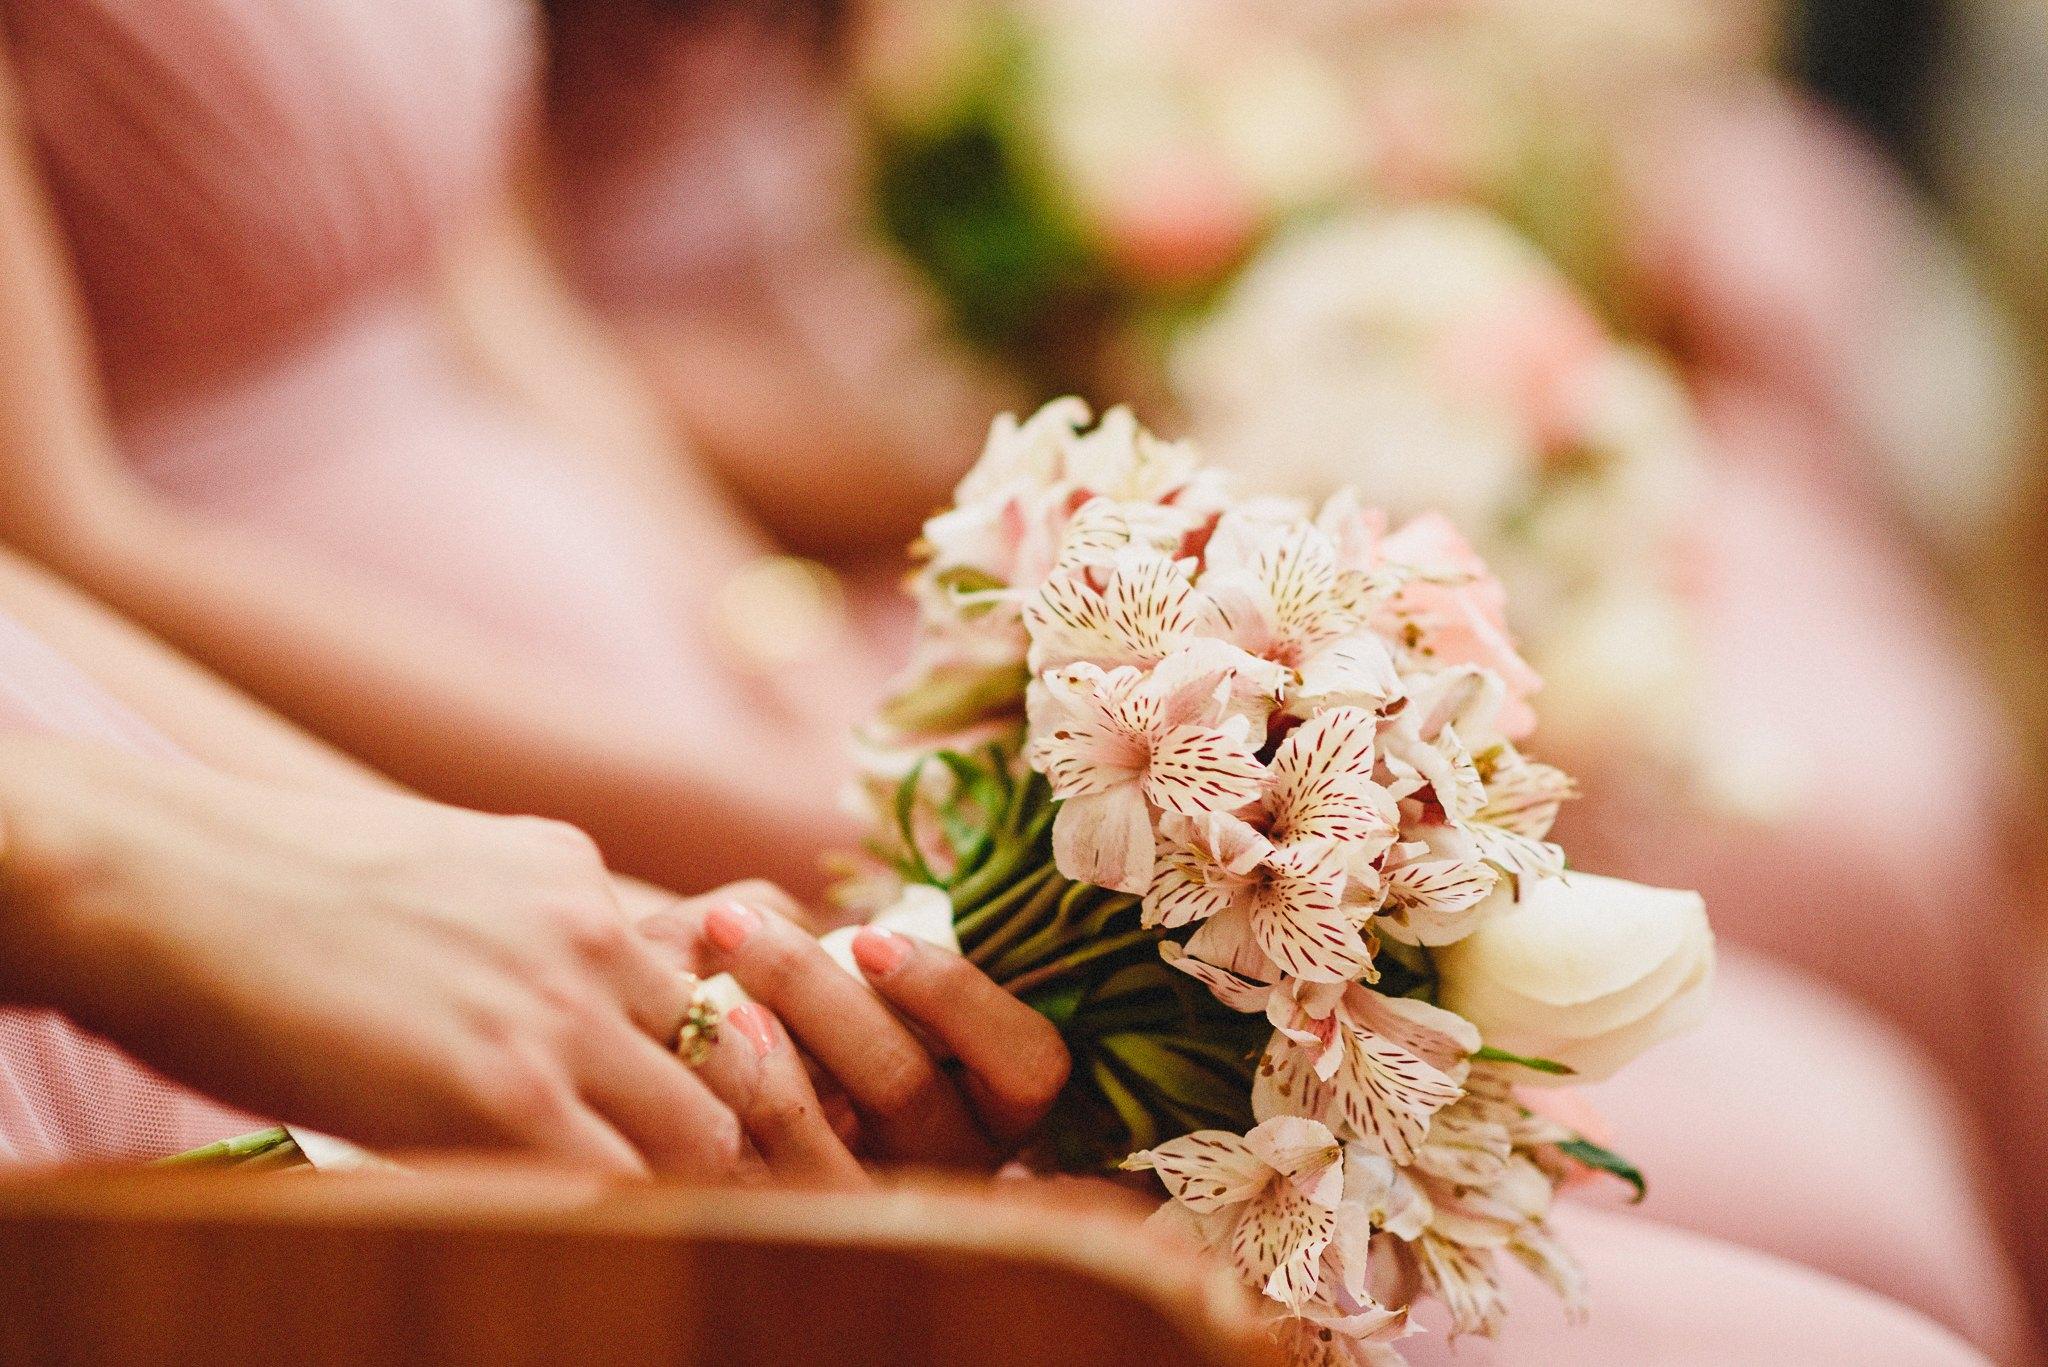 Wedding-Boda-Tulancingo-Hidalgo-Salon-Essenzia-Luis-Houdin-22-film